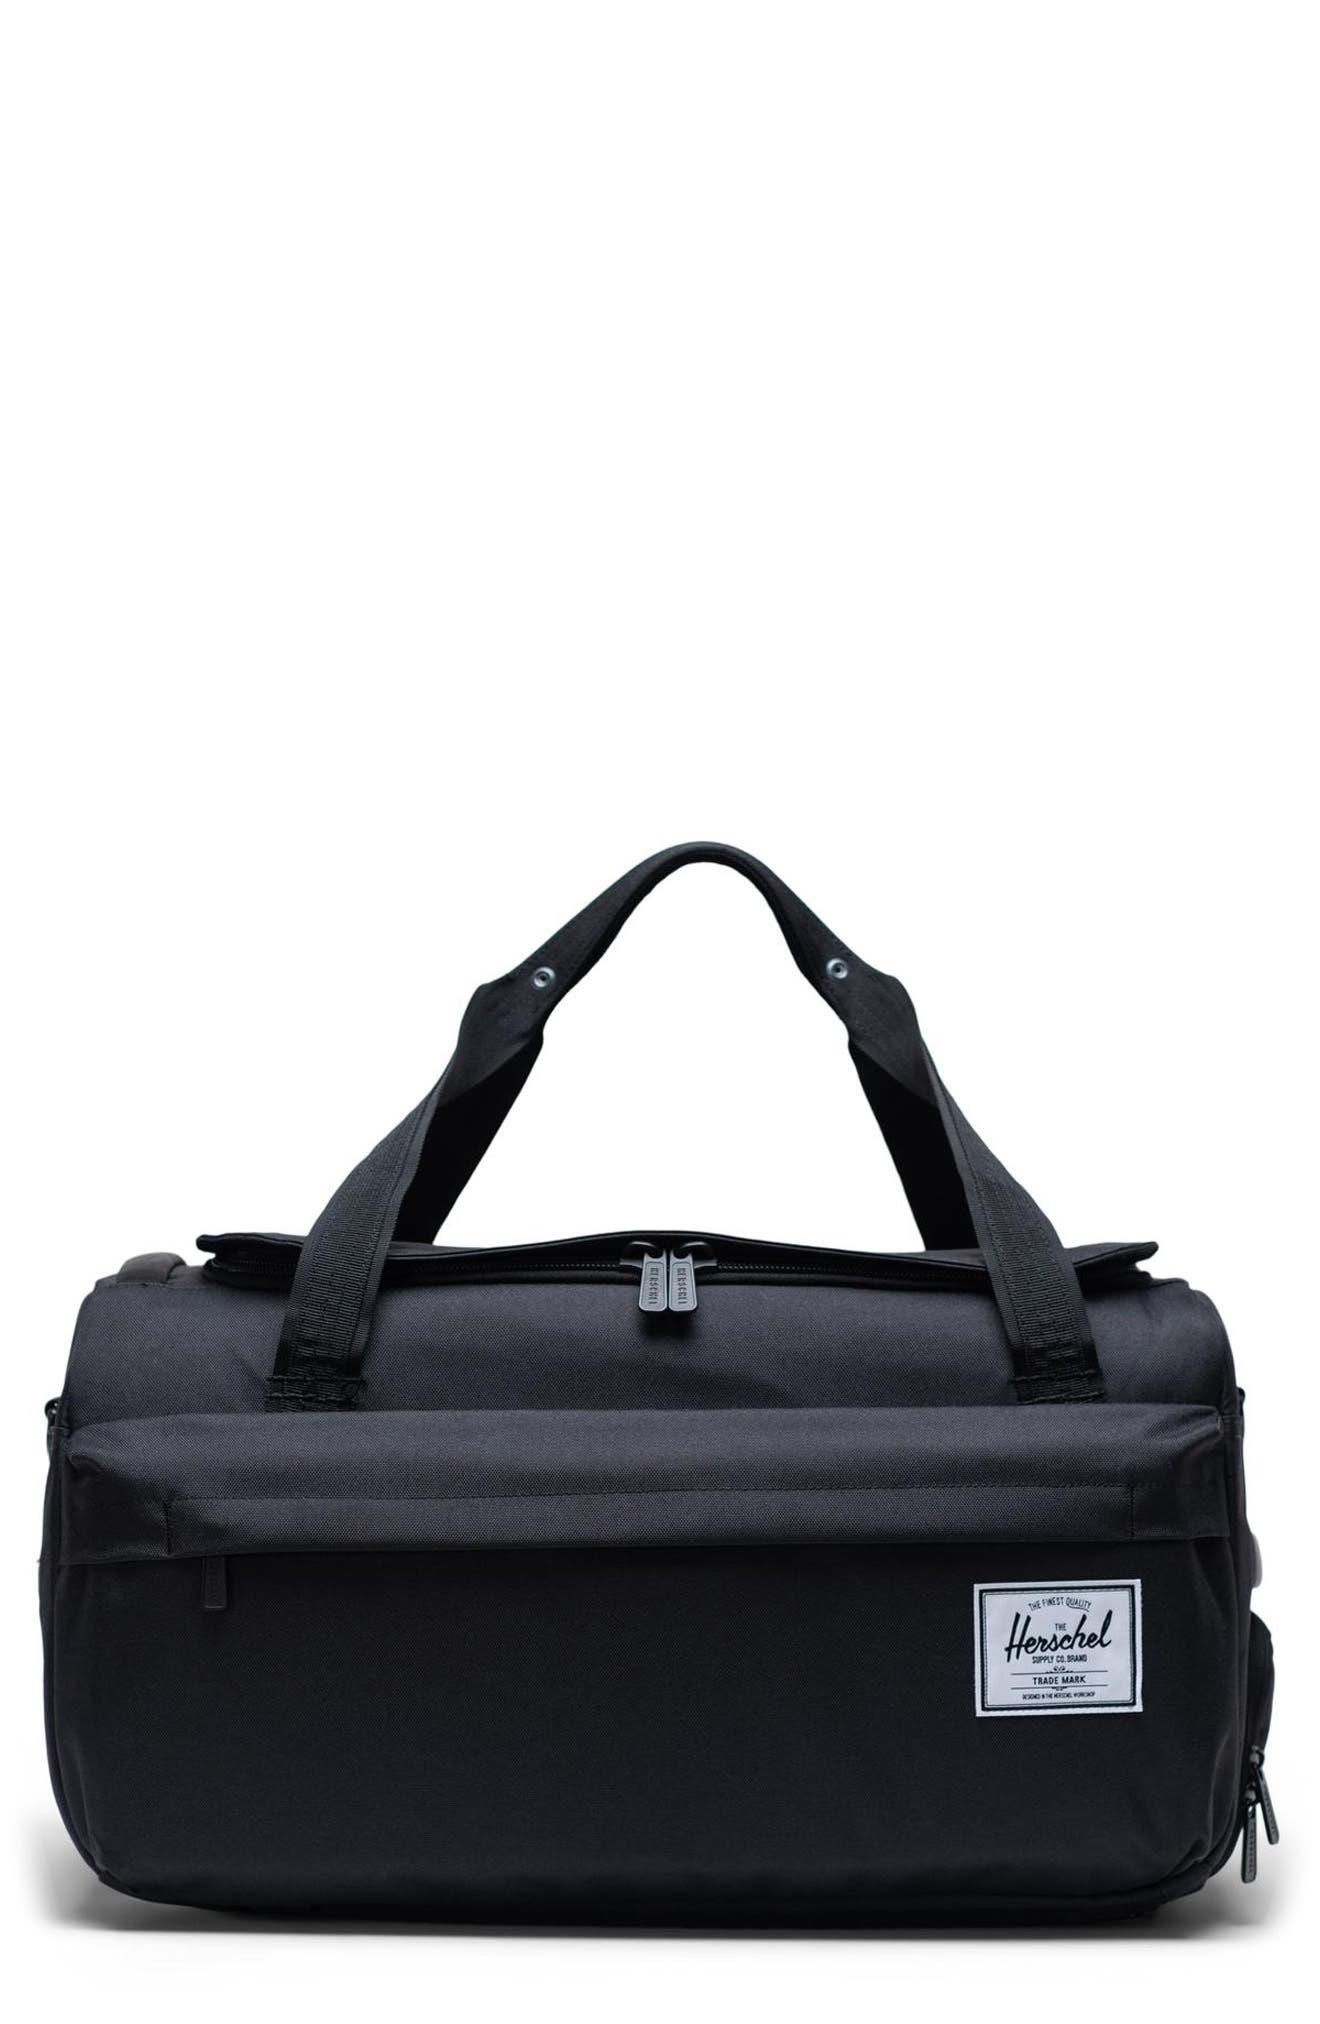 Outfitter 30-Liter Convertible Duffle Bag